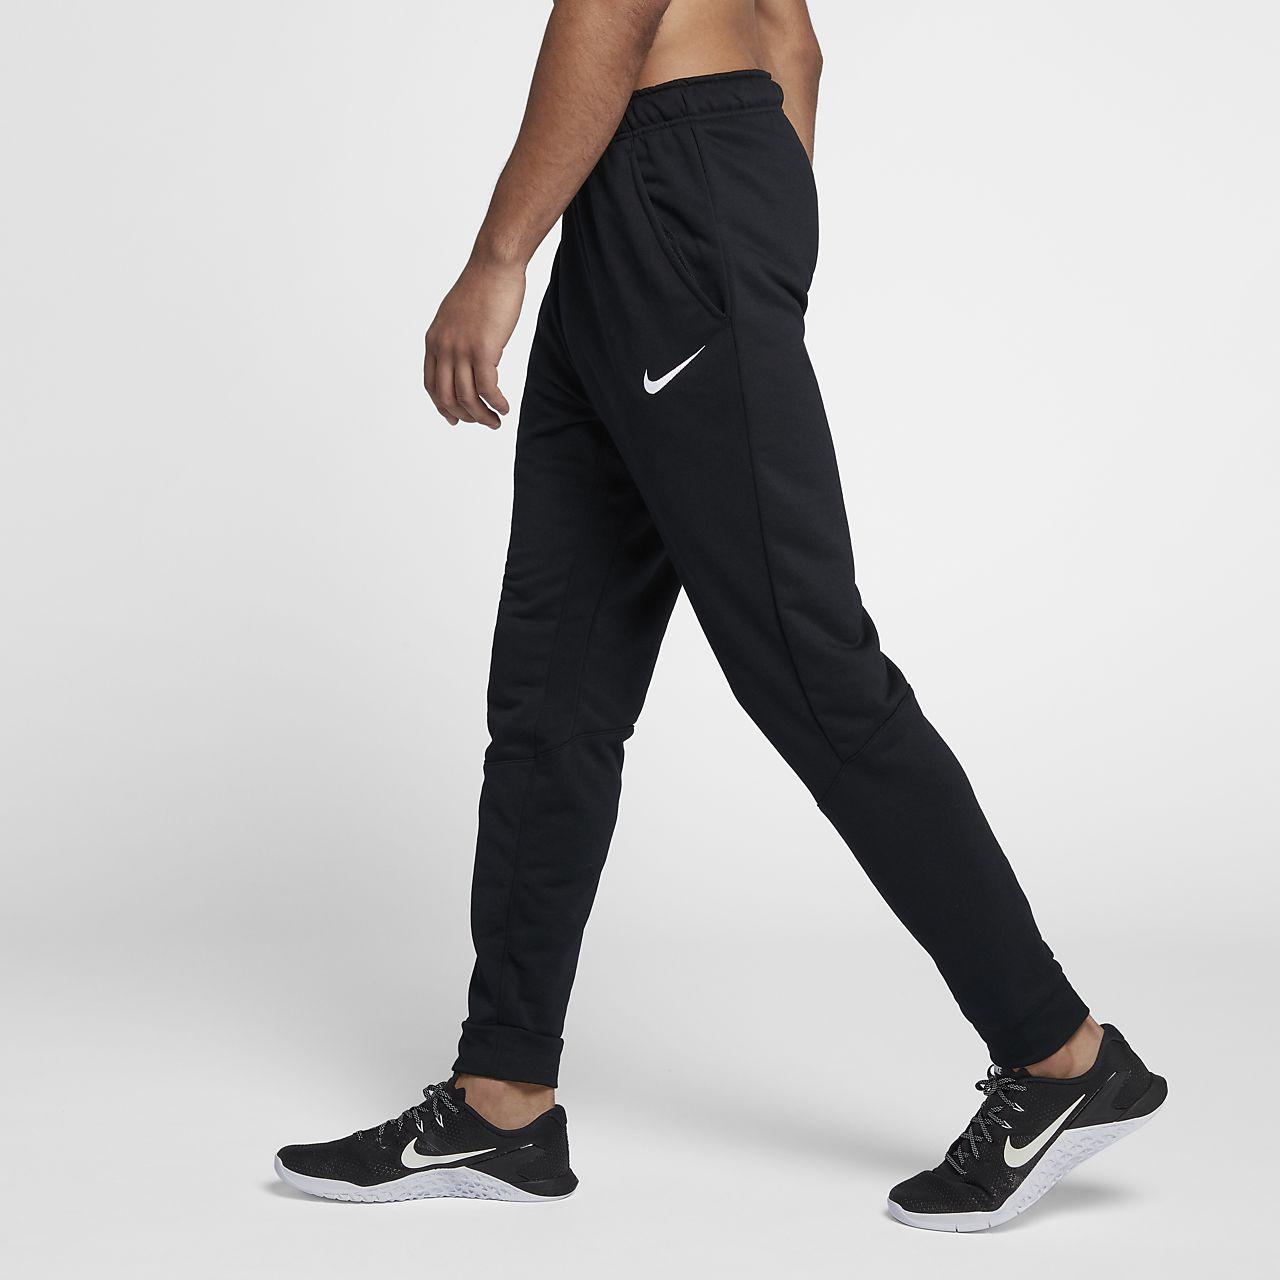 nike pantalon homme 2019